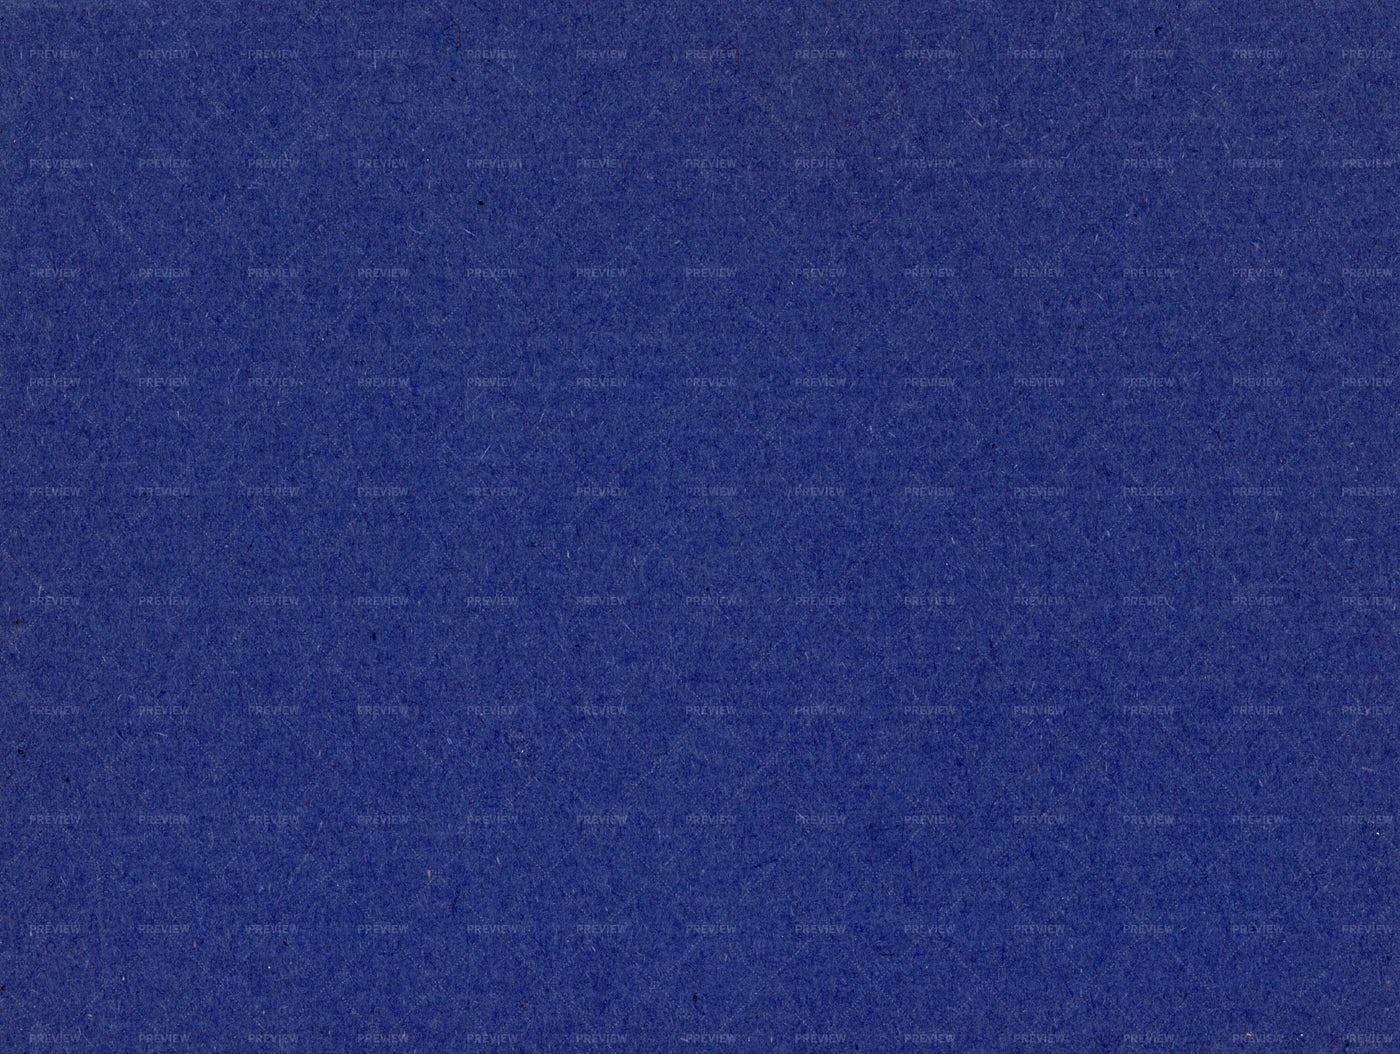 Blue Cardboard: Stock Photos